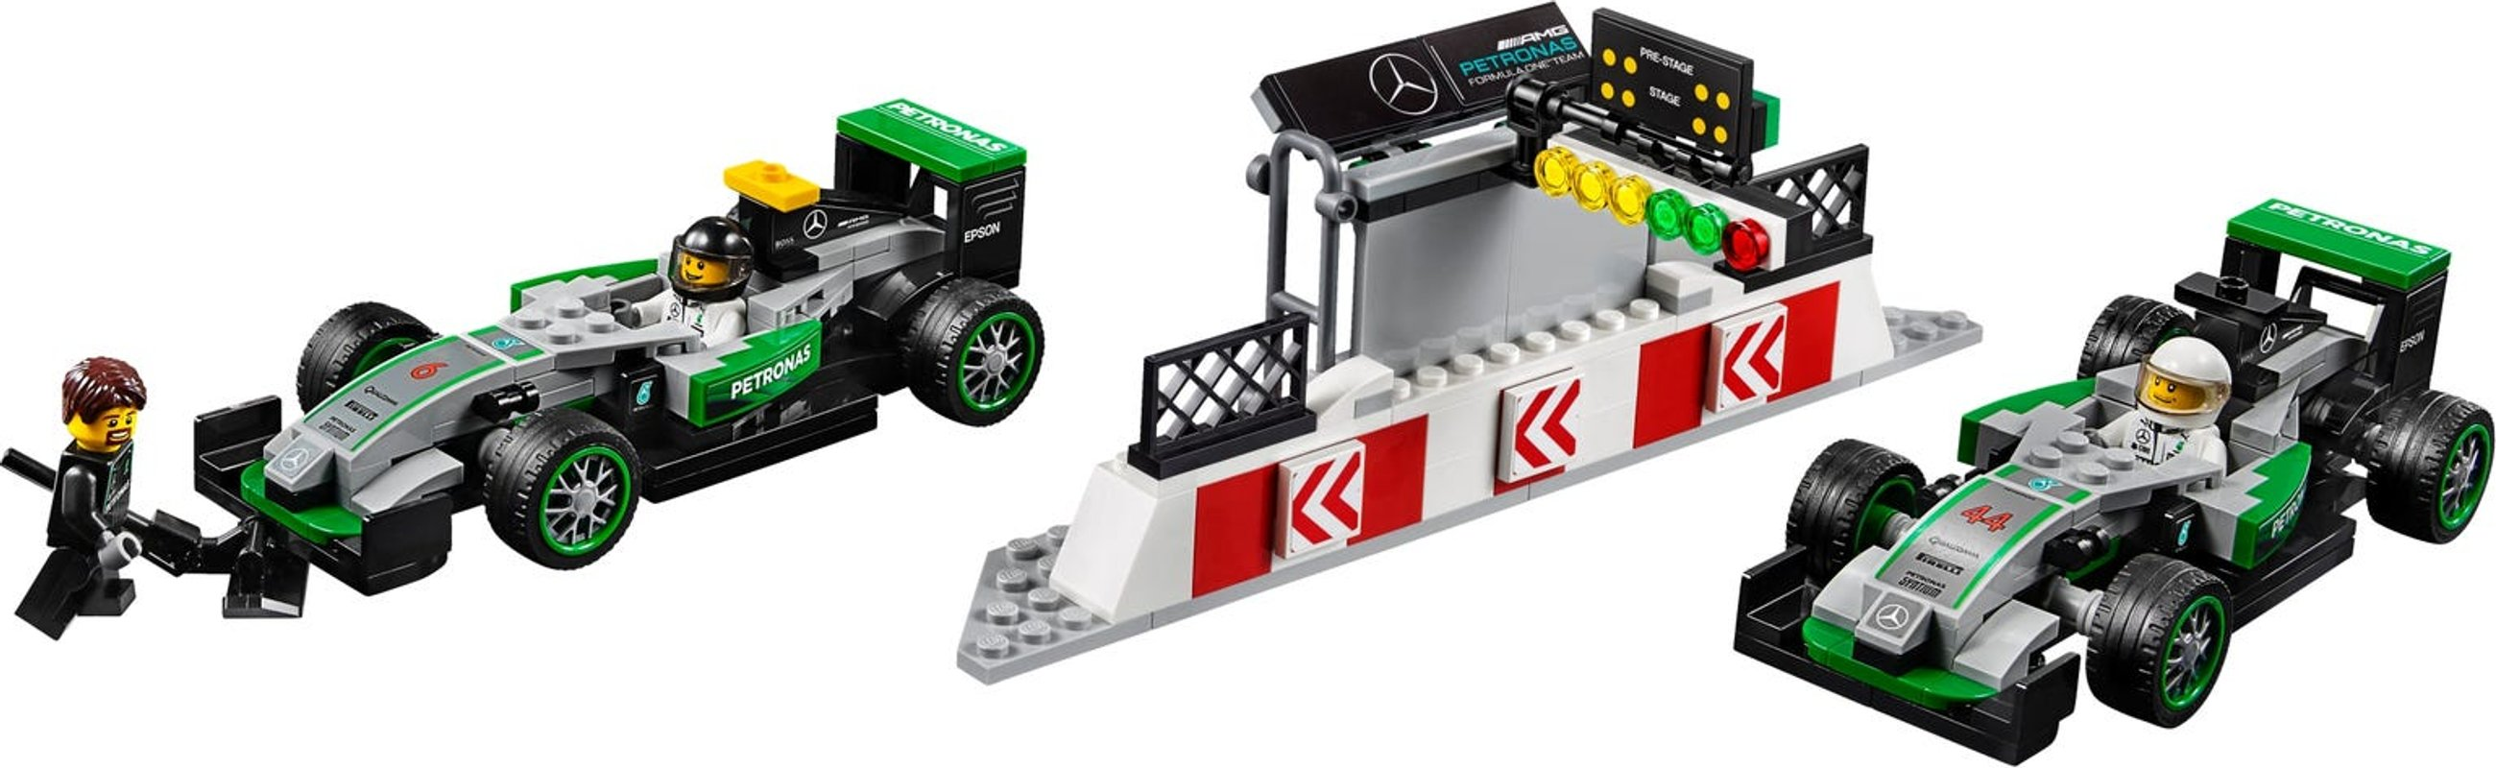 MERCEDES AMG PETRONAS Formula One™ Team components